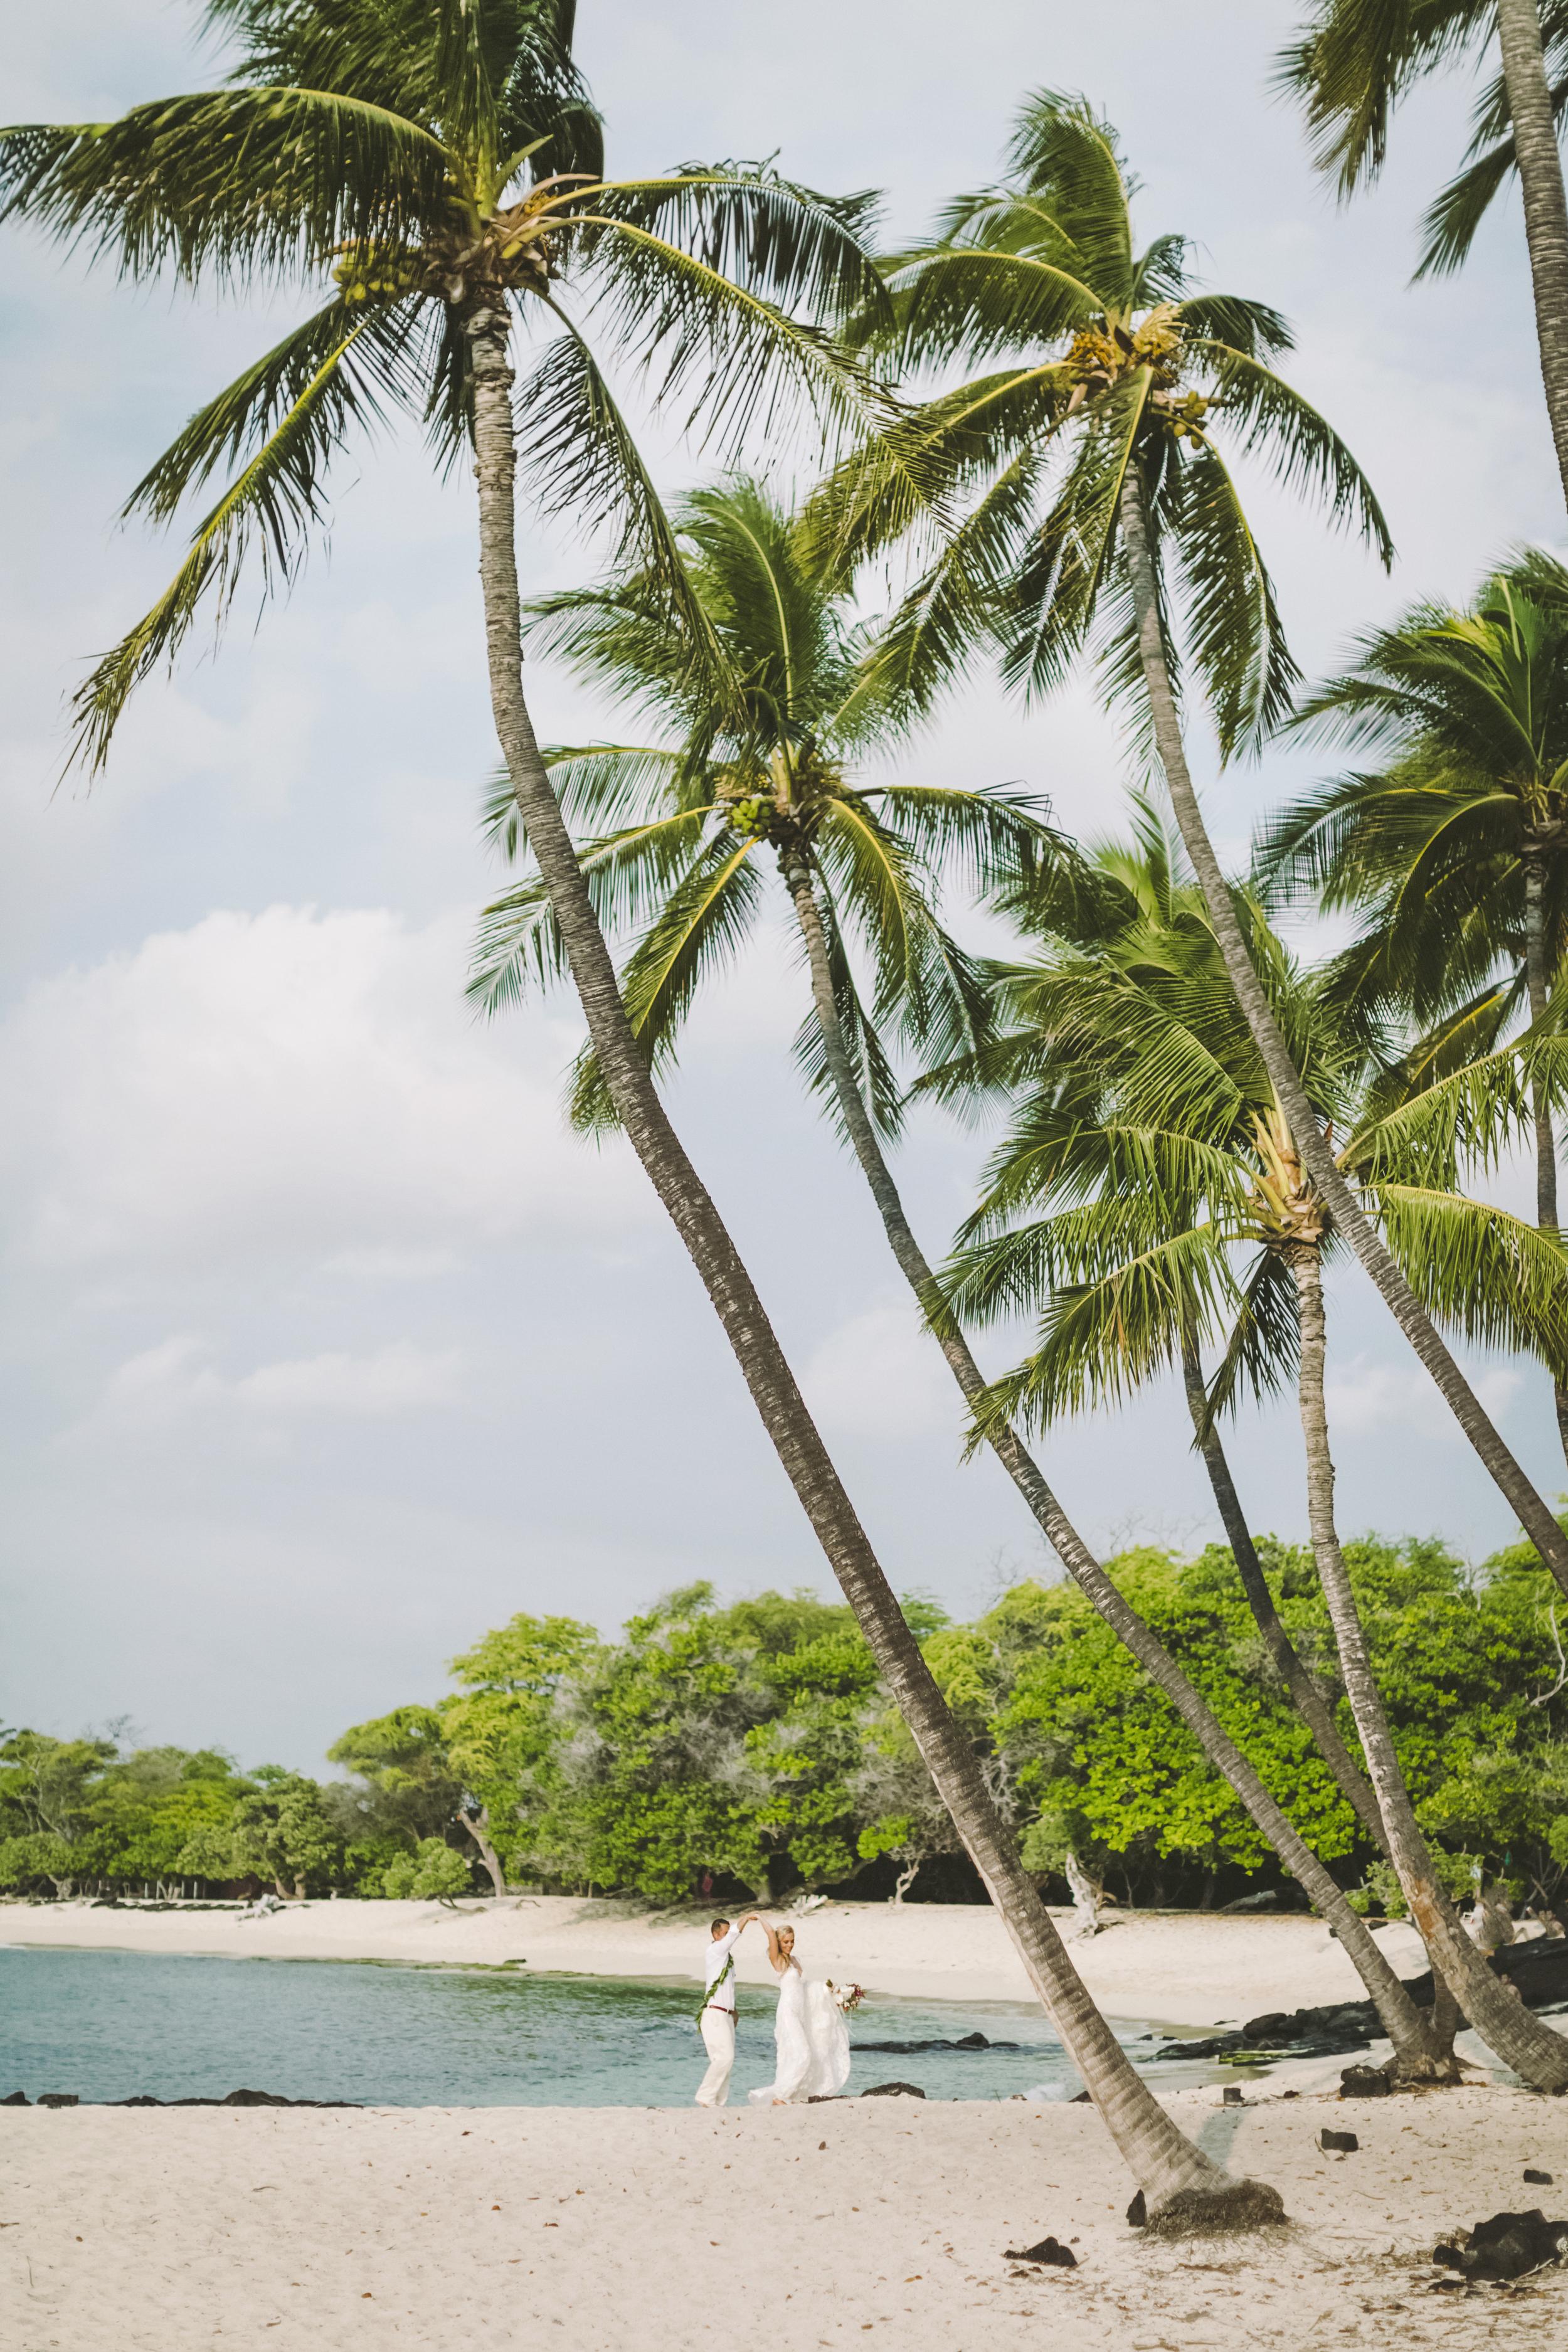 angie-diaz-photography-hawaii-wedding-photographer-kelli-jay-91.jpg